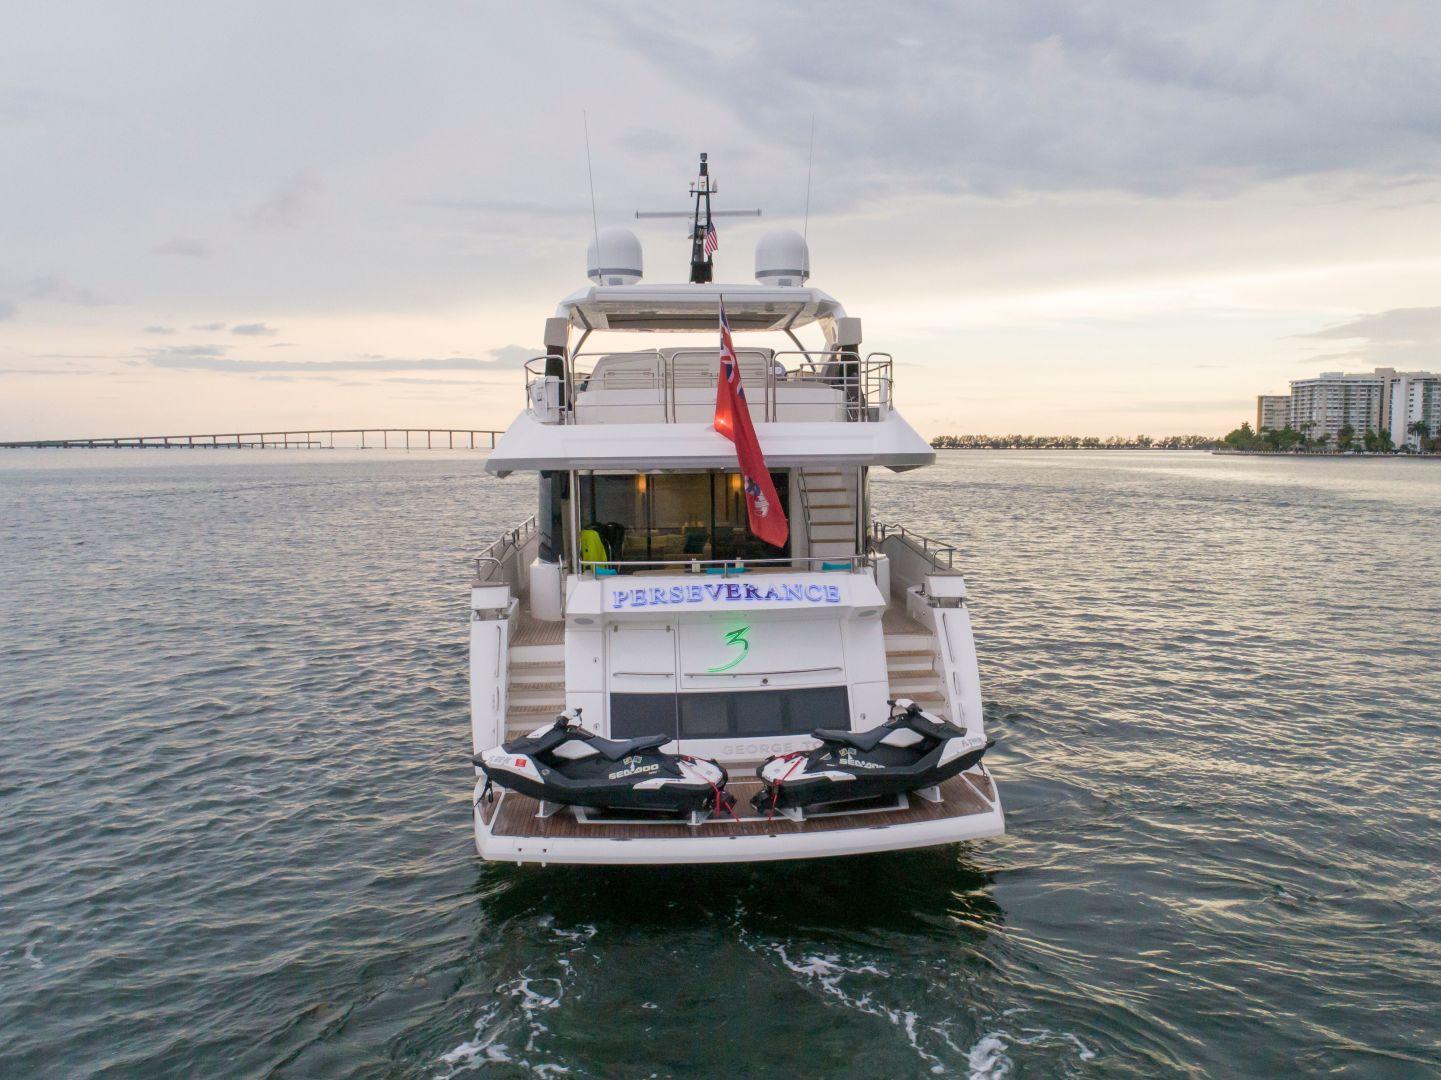 Sunseeker-95 Yacht 2017-Perseverance 3 Ft Lauderdale-Florida-United States-1400072   Thumbnail